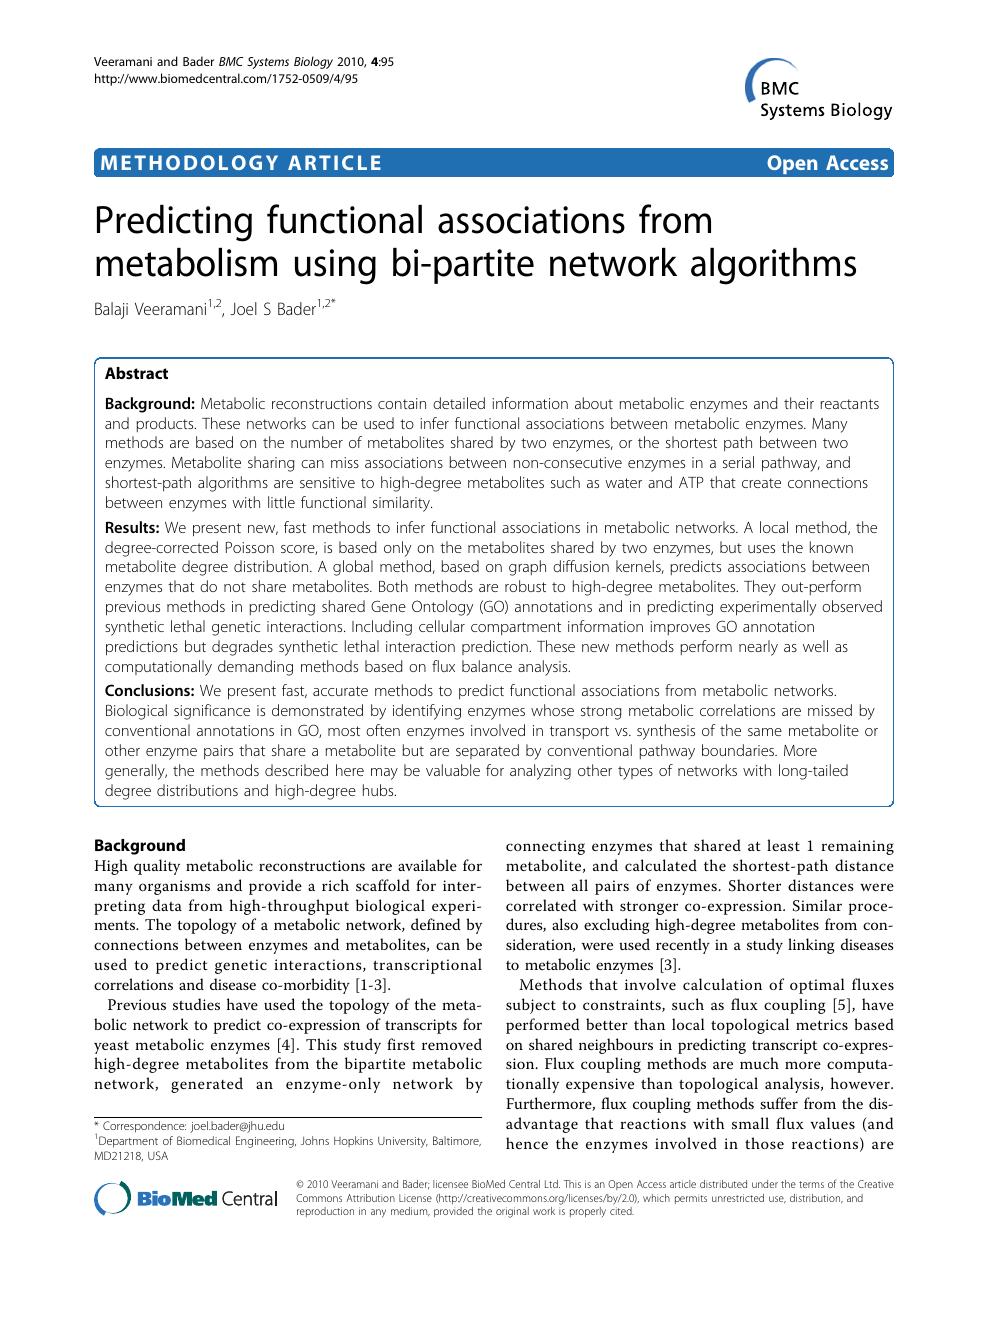 Predicting functional associations from metabolism using bi